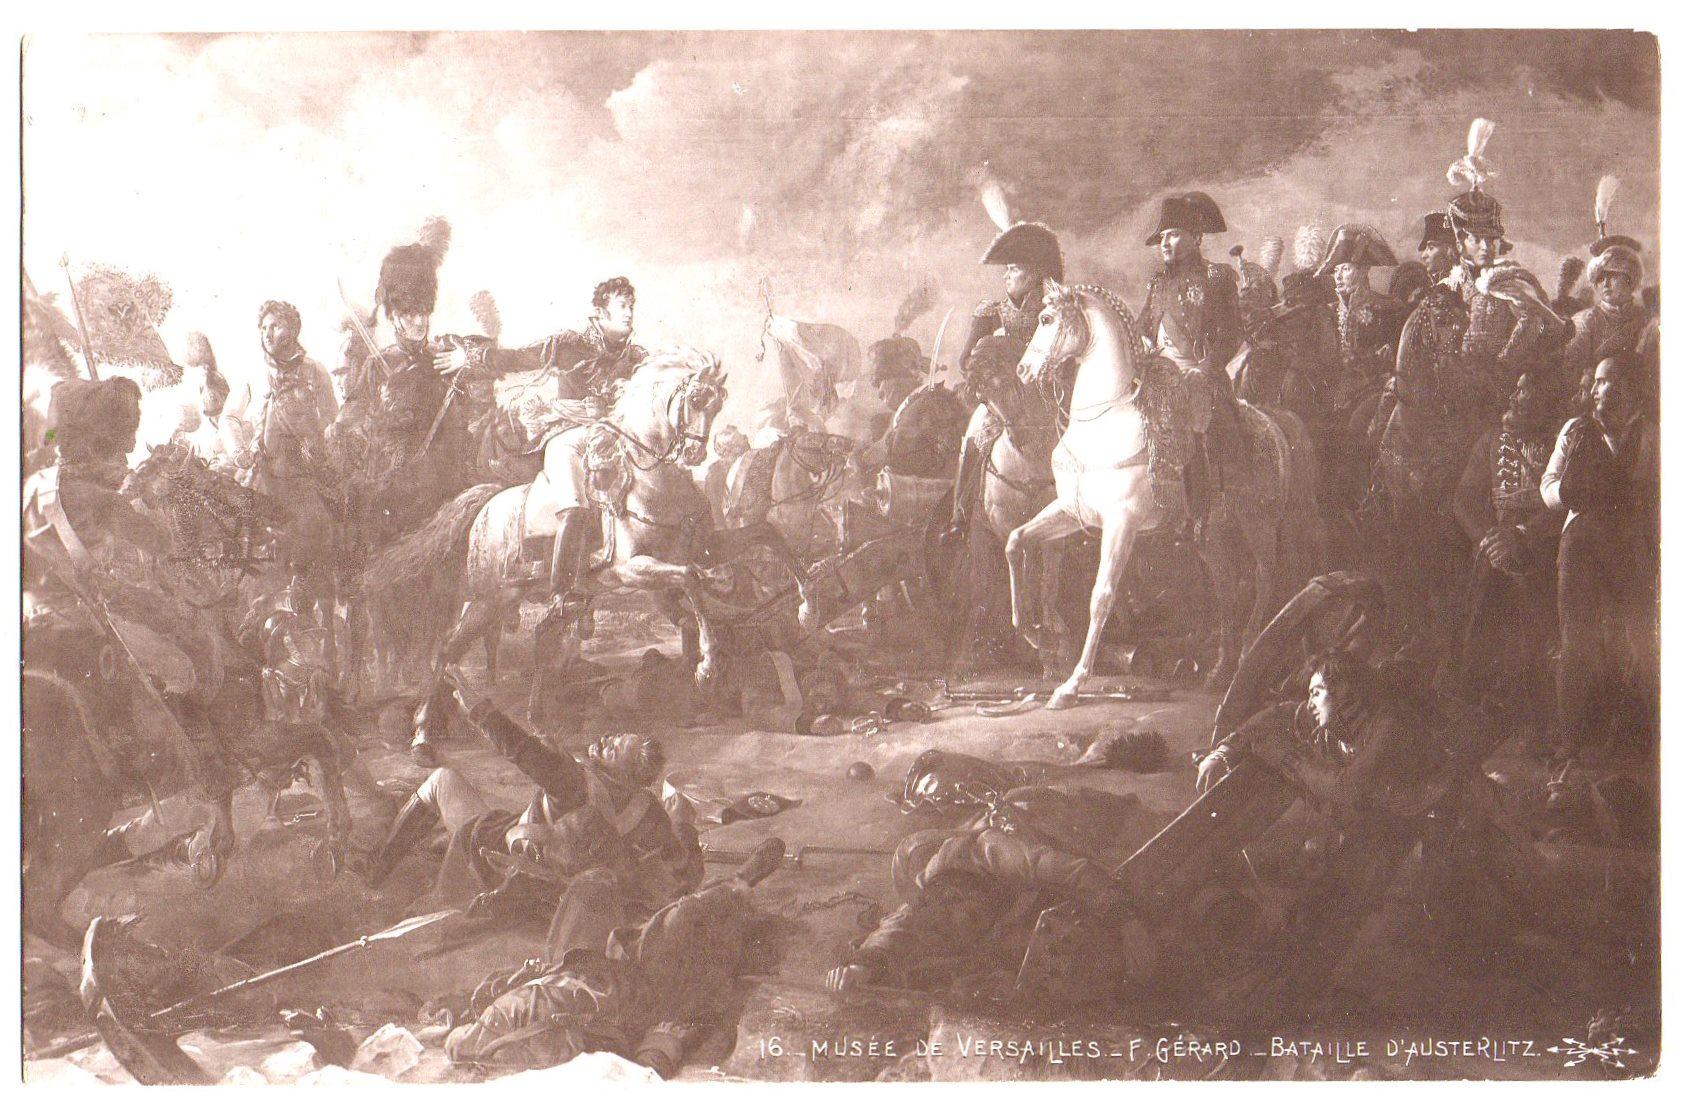 "Поштова листівка. ""Musée de Versailles._ F. Gerard._ Bataille d'Austerlitz / Ф. Жерар._Битва при Аустерліці"""